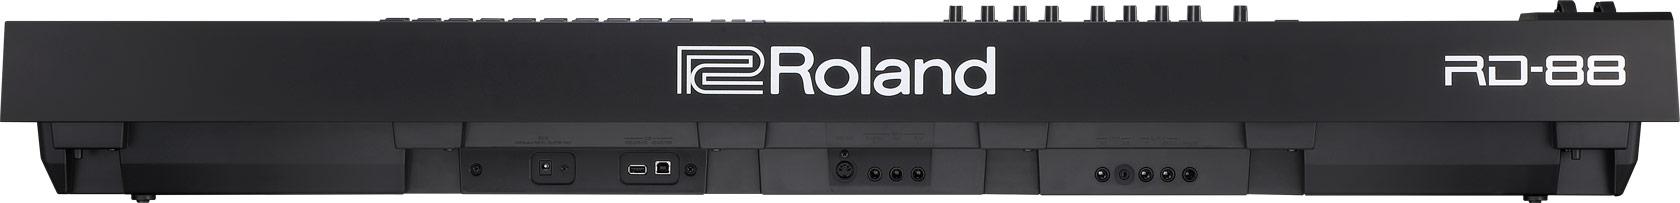 Roland RD-88 piano stage tastiera keyboard studio live strumenti musicali